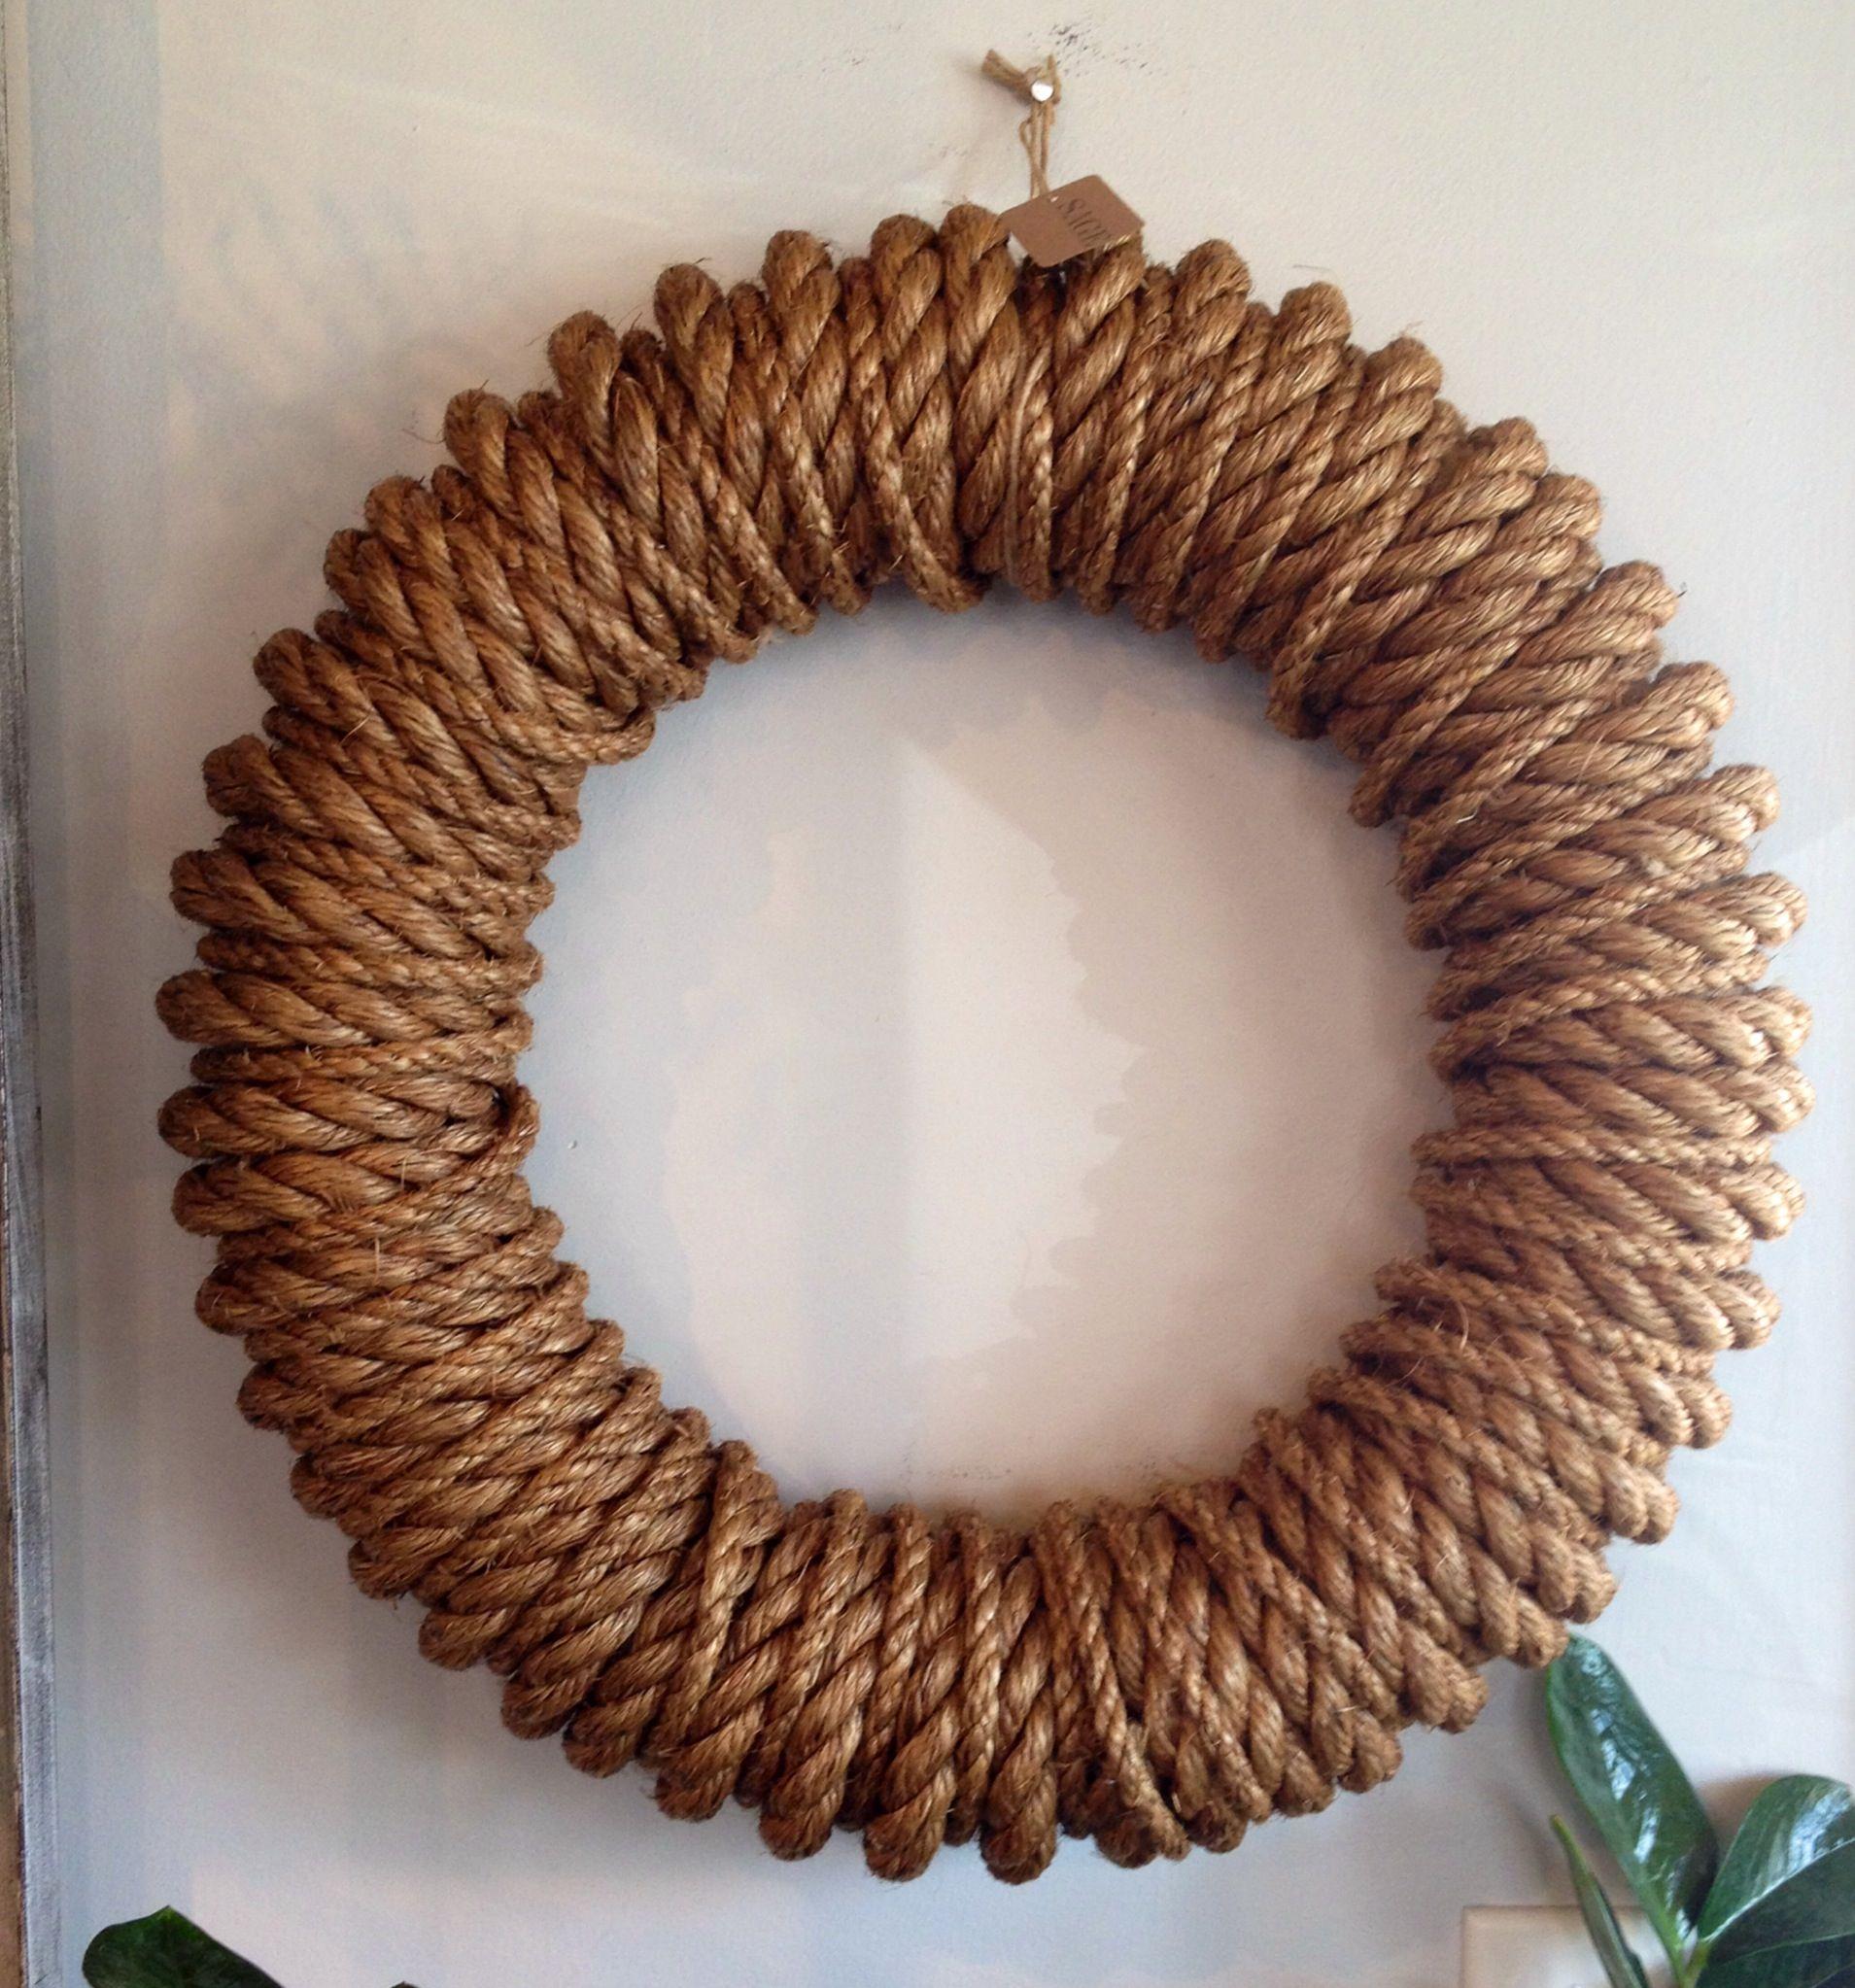 Handmade Rope Wreaths Nautical Wreath Diy Wreath Wire Wreath Forms